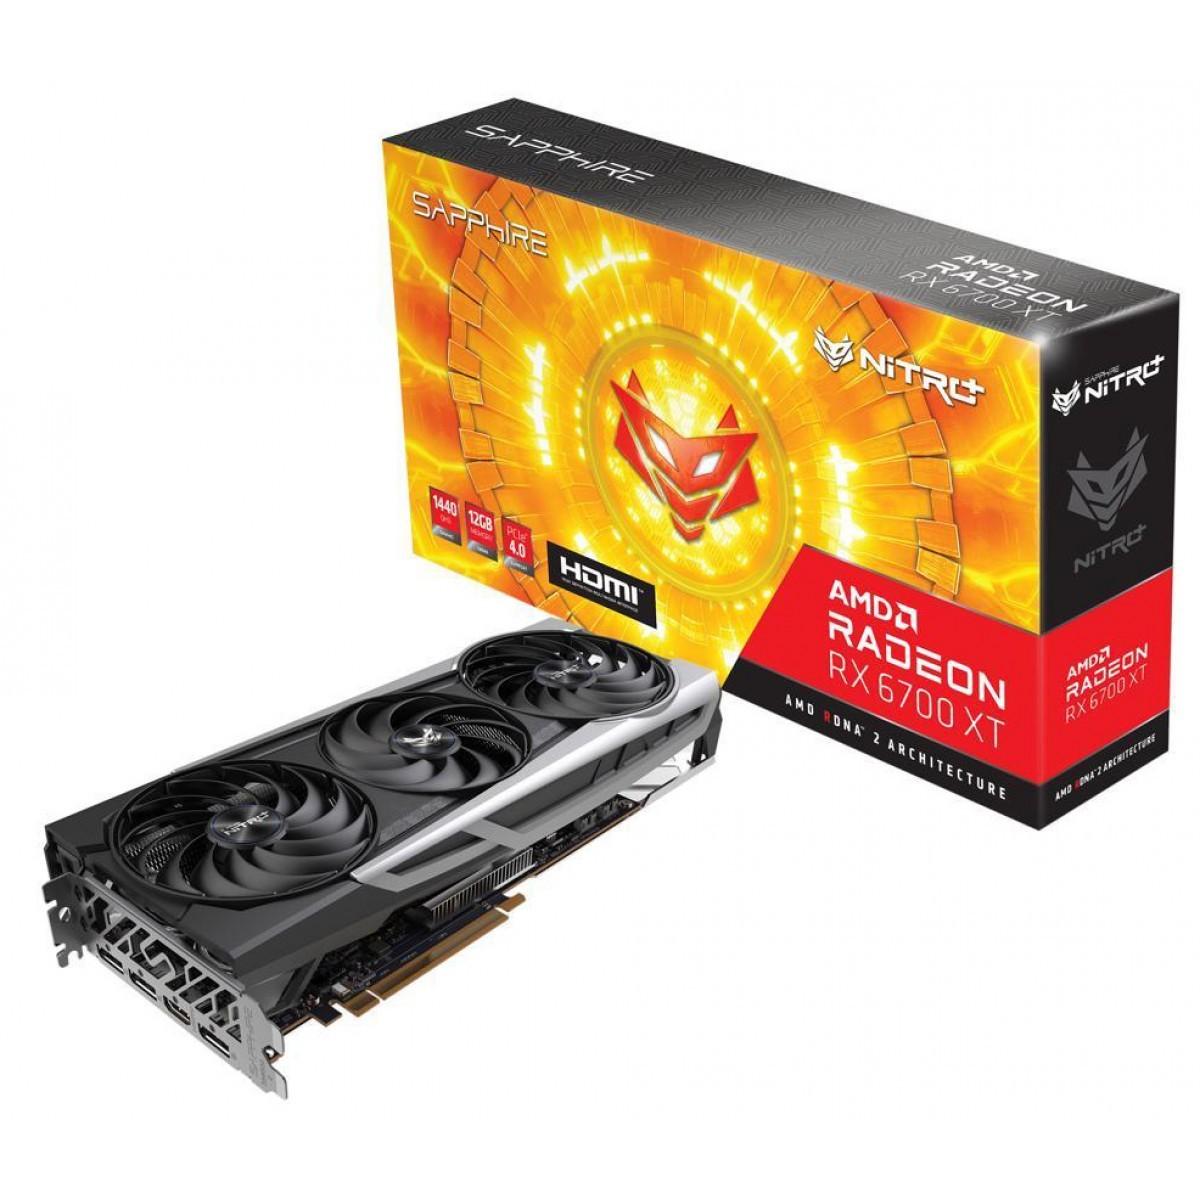 Kit Upgrade Sapphire Radeon Nitro+ AMD Radeon RX 6700 XT + AMD Ryzen 7 3700X + Brinde Jogo Dirt 5